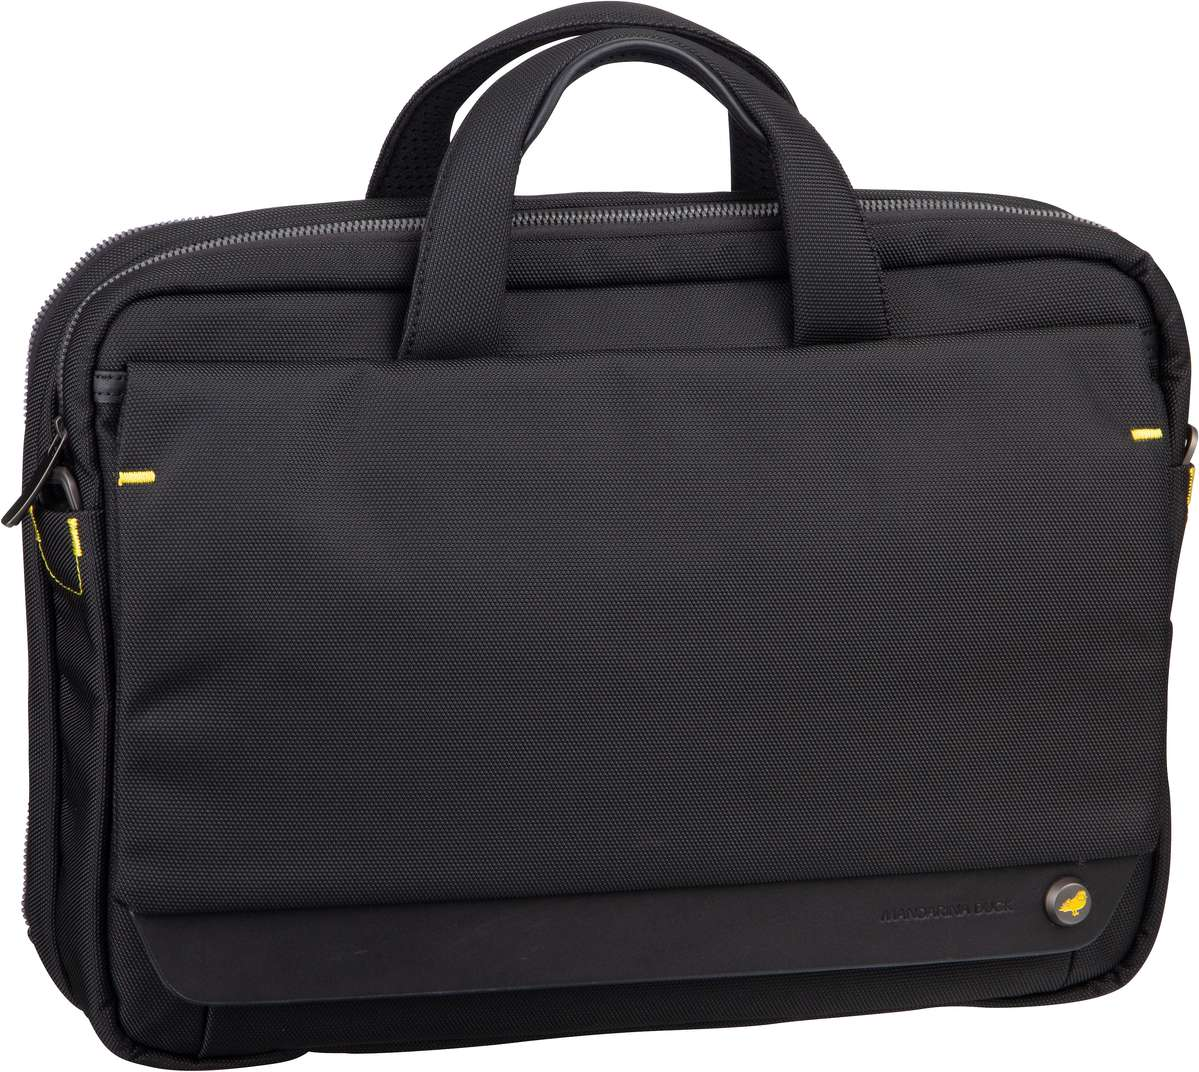 Mandarina Duck Notebooktasche / Tablet Mr. Duck Briefcase STC02 Black